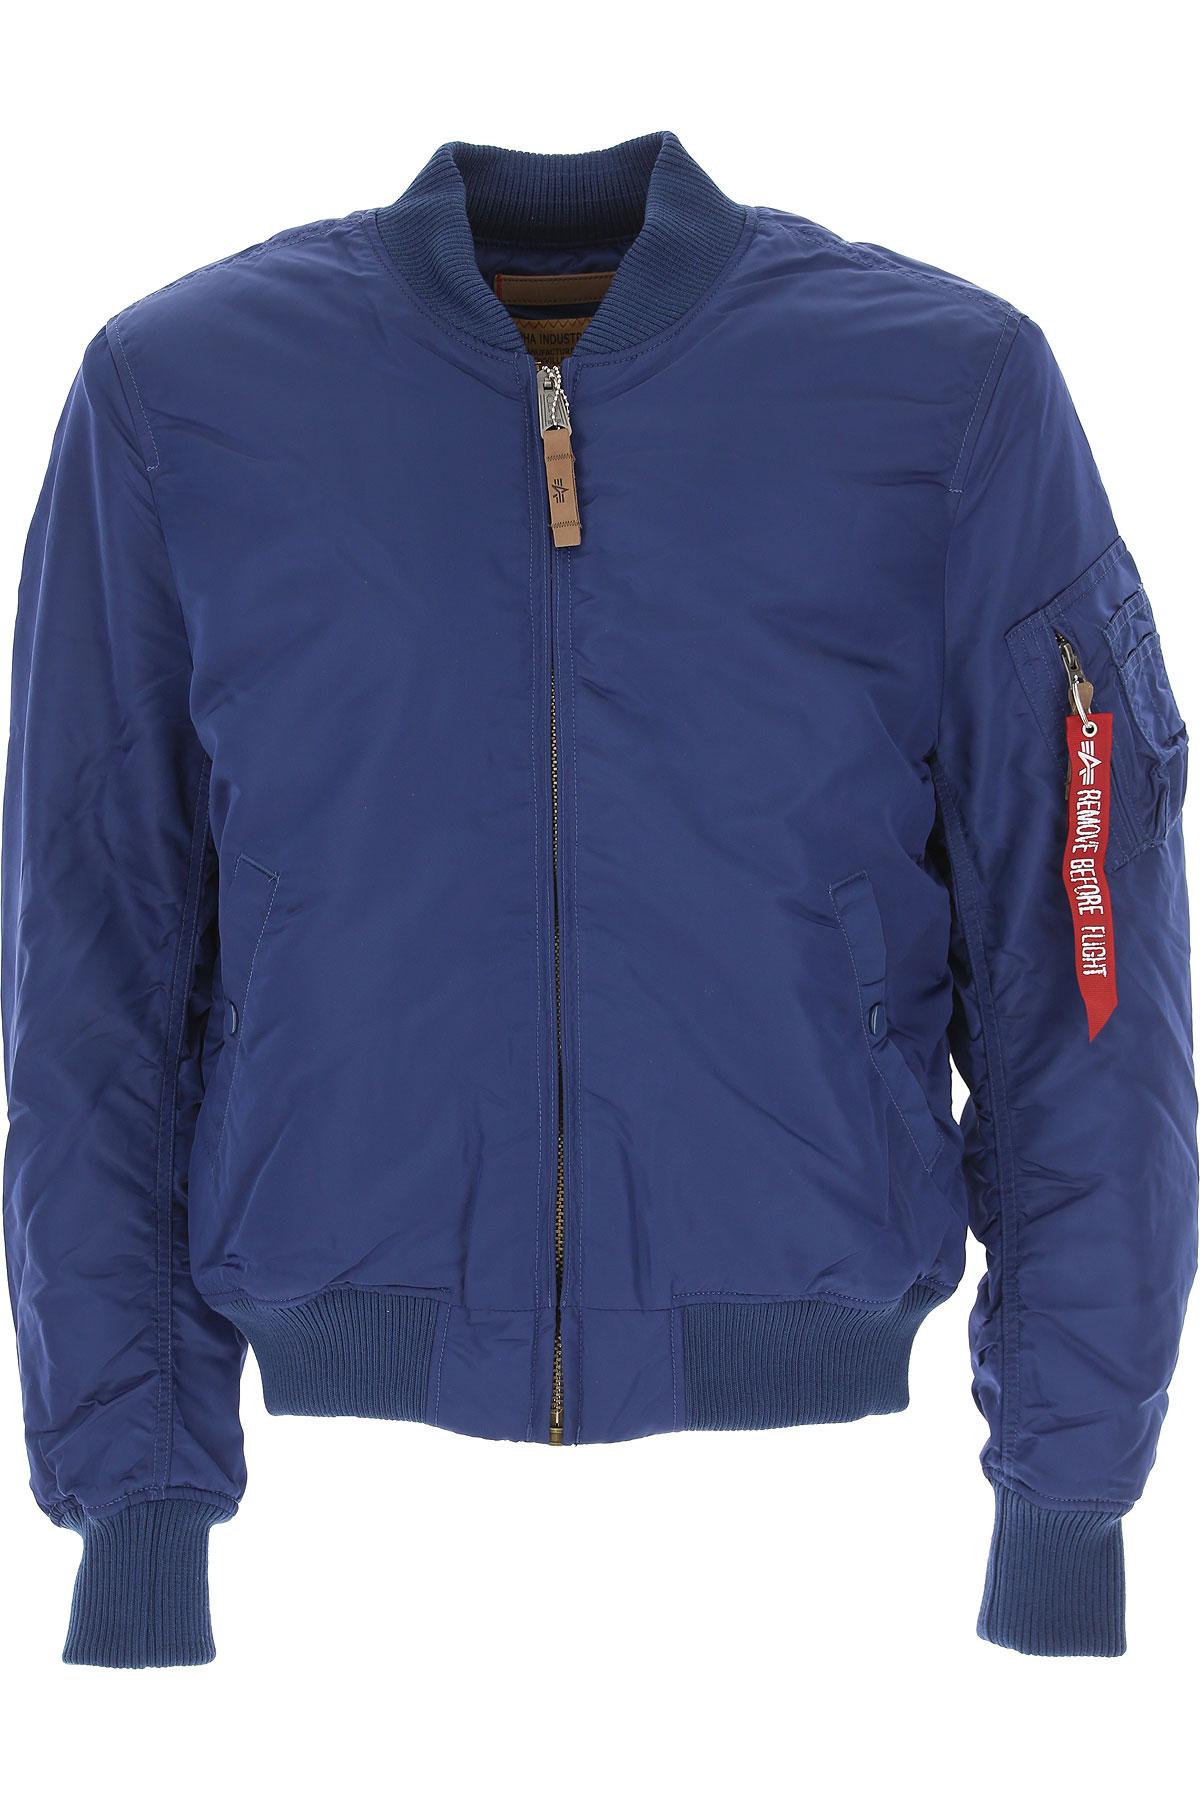 Image of Alpha Industries Jacket for Men, Ocean Blue, polyester, 2017, L M S XL